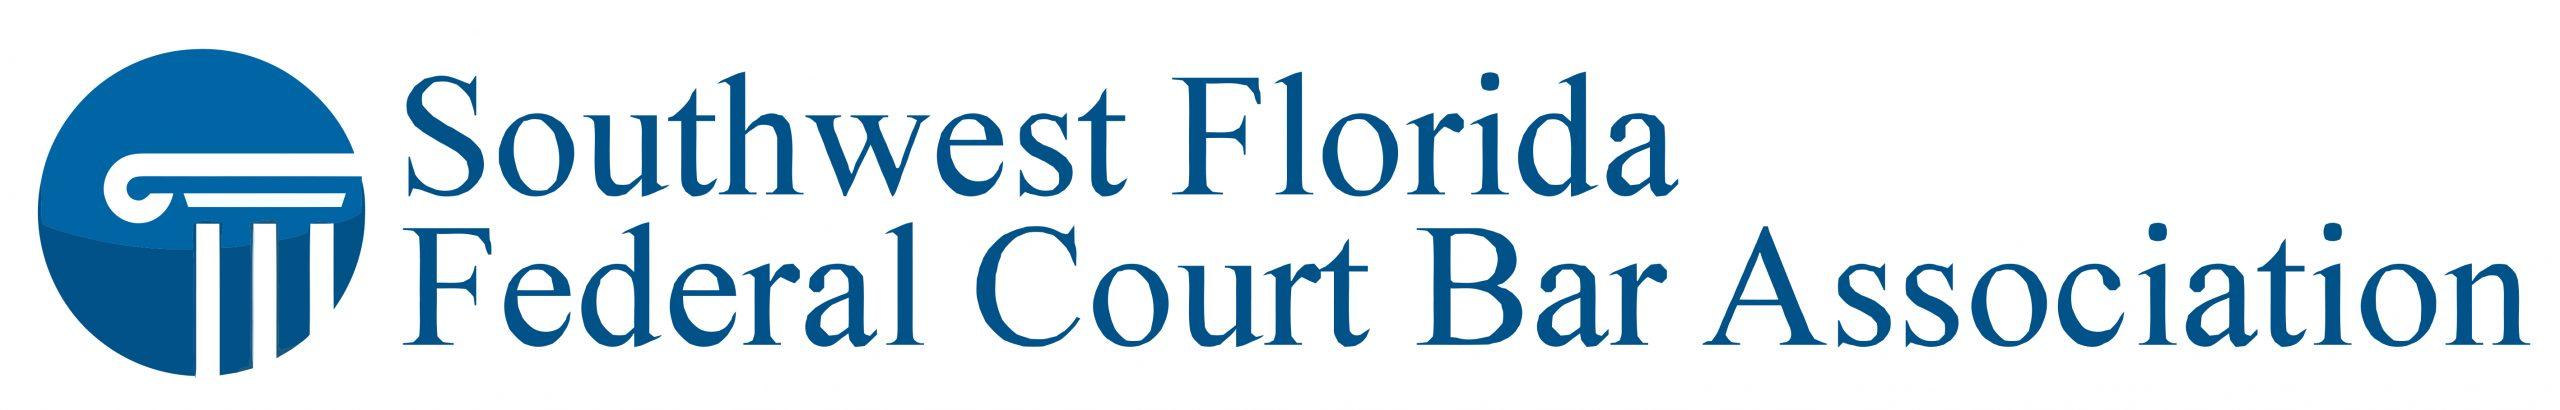 Southwest Florida Federal Court Bar Association